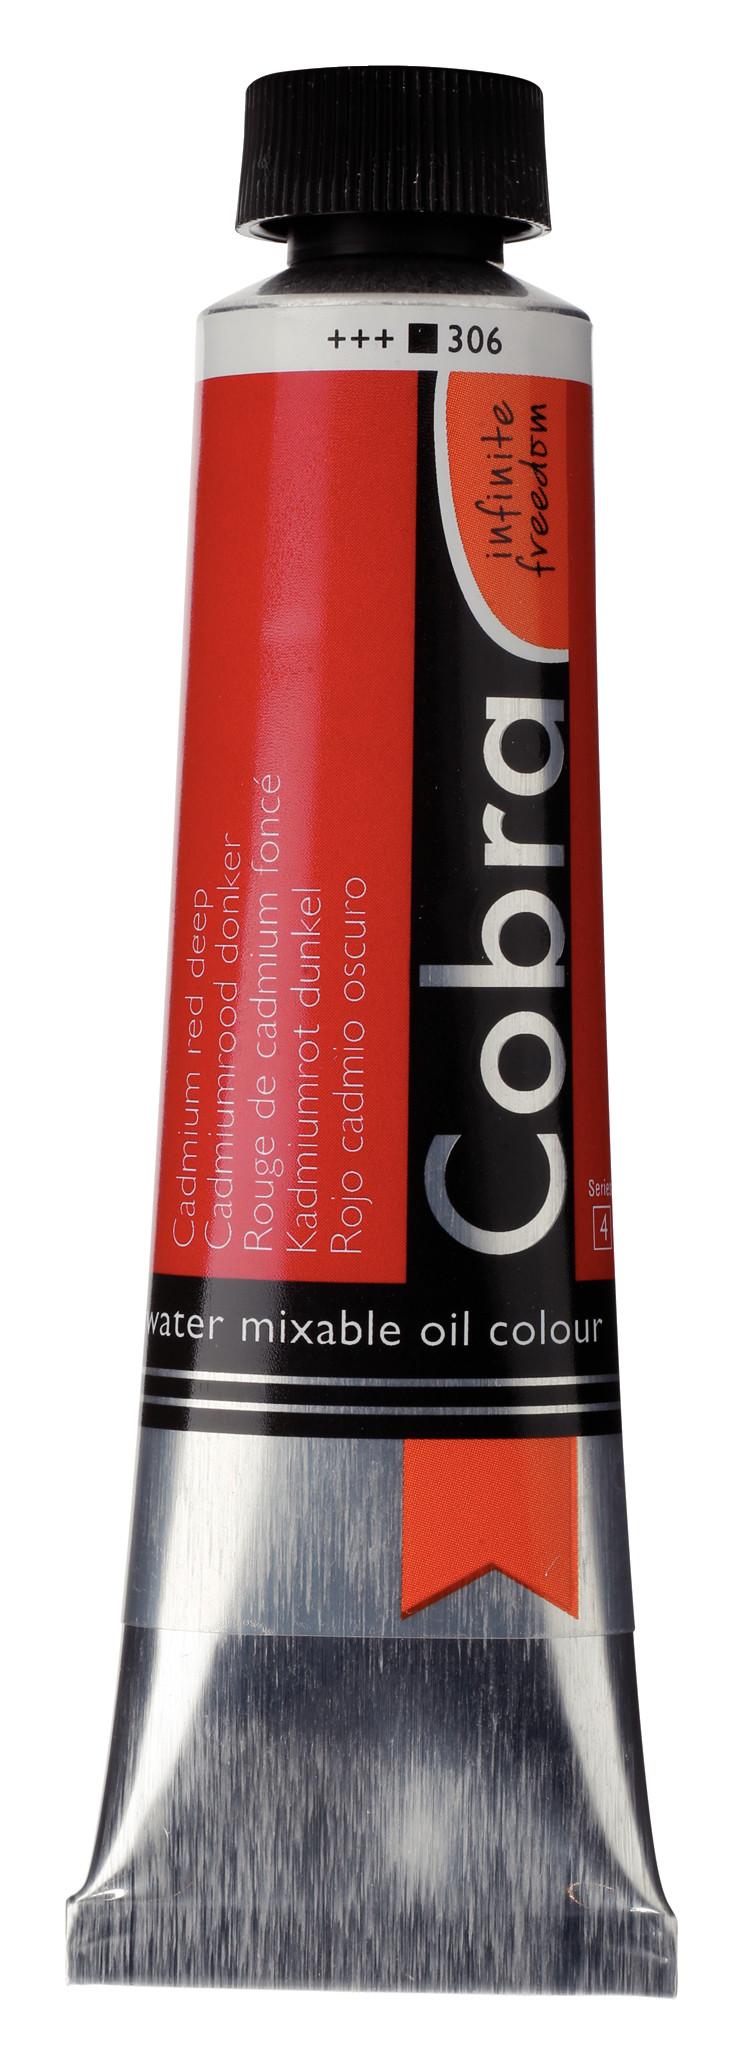 Cobra Artist Water Mixable Oil Colour Tube 40 ml Cadmium red deep  306